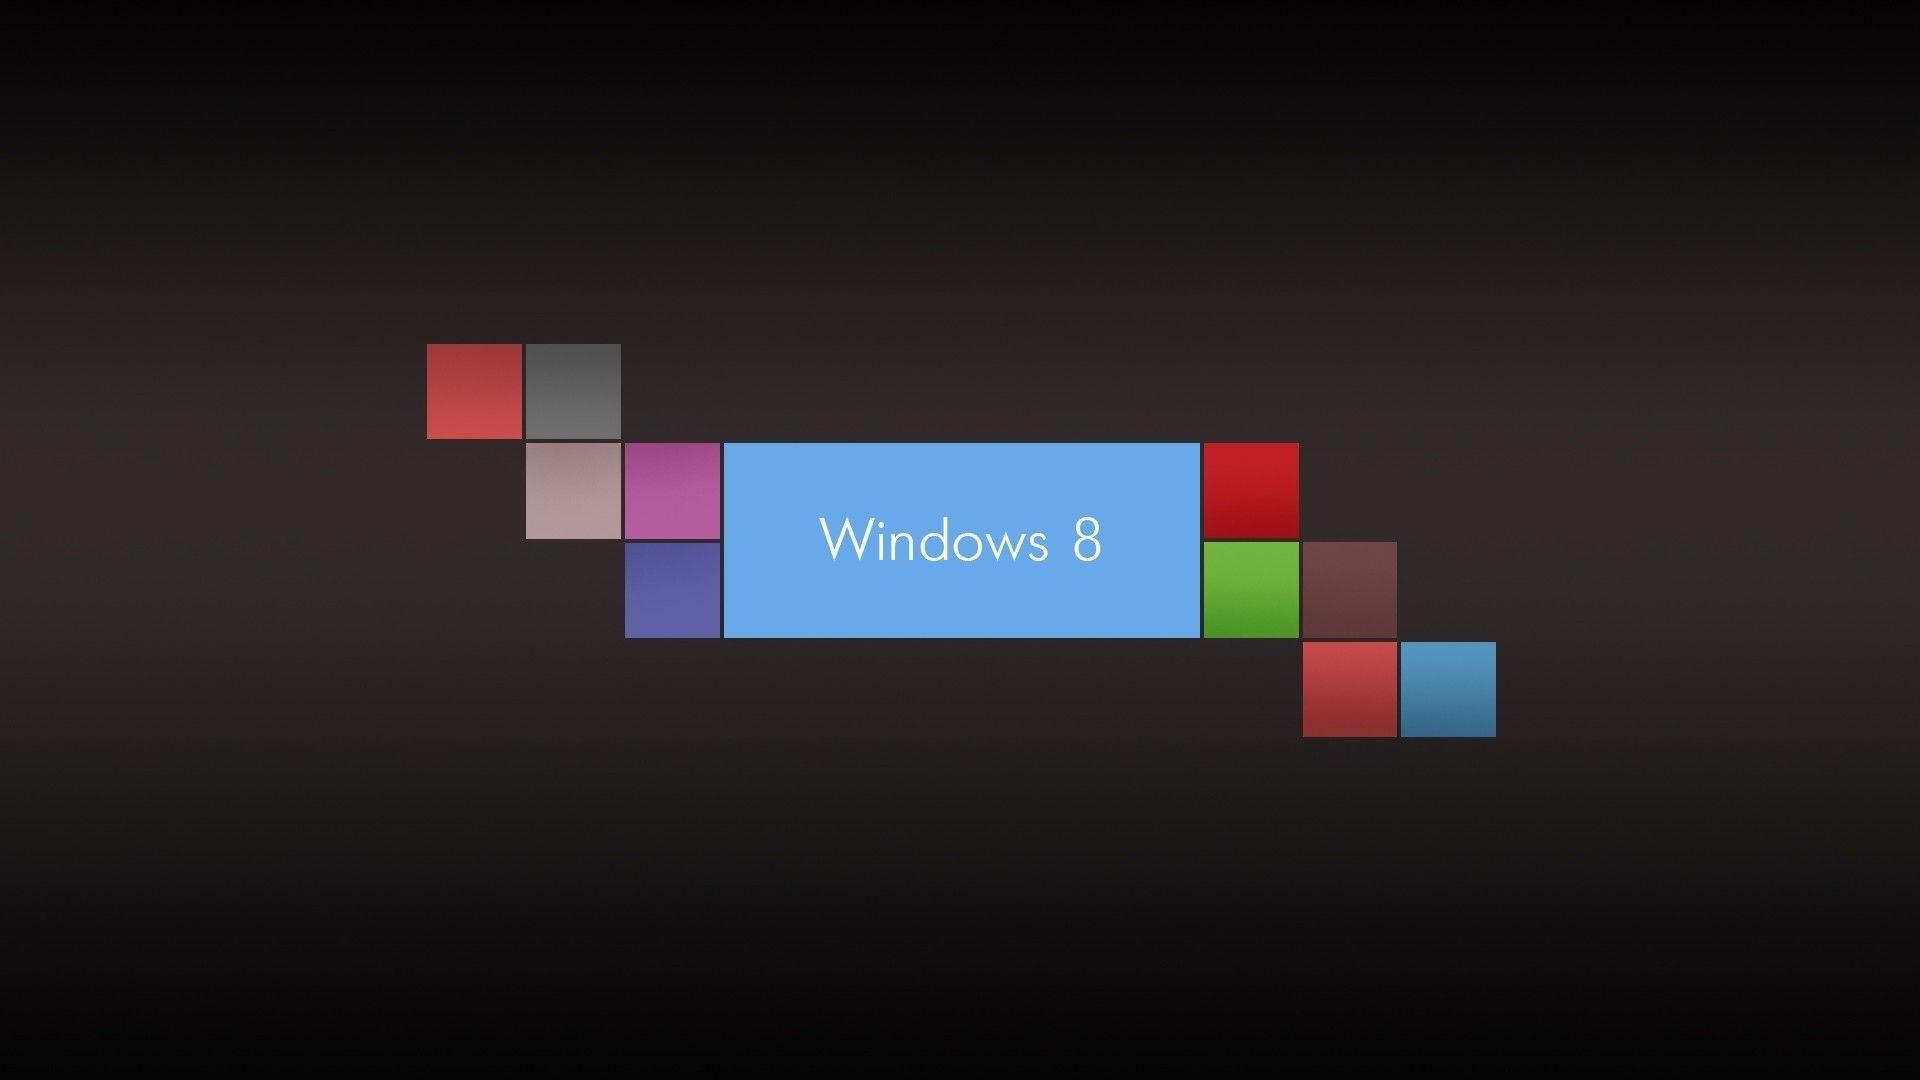 windows 8 wallpaper hd ·①